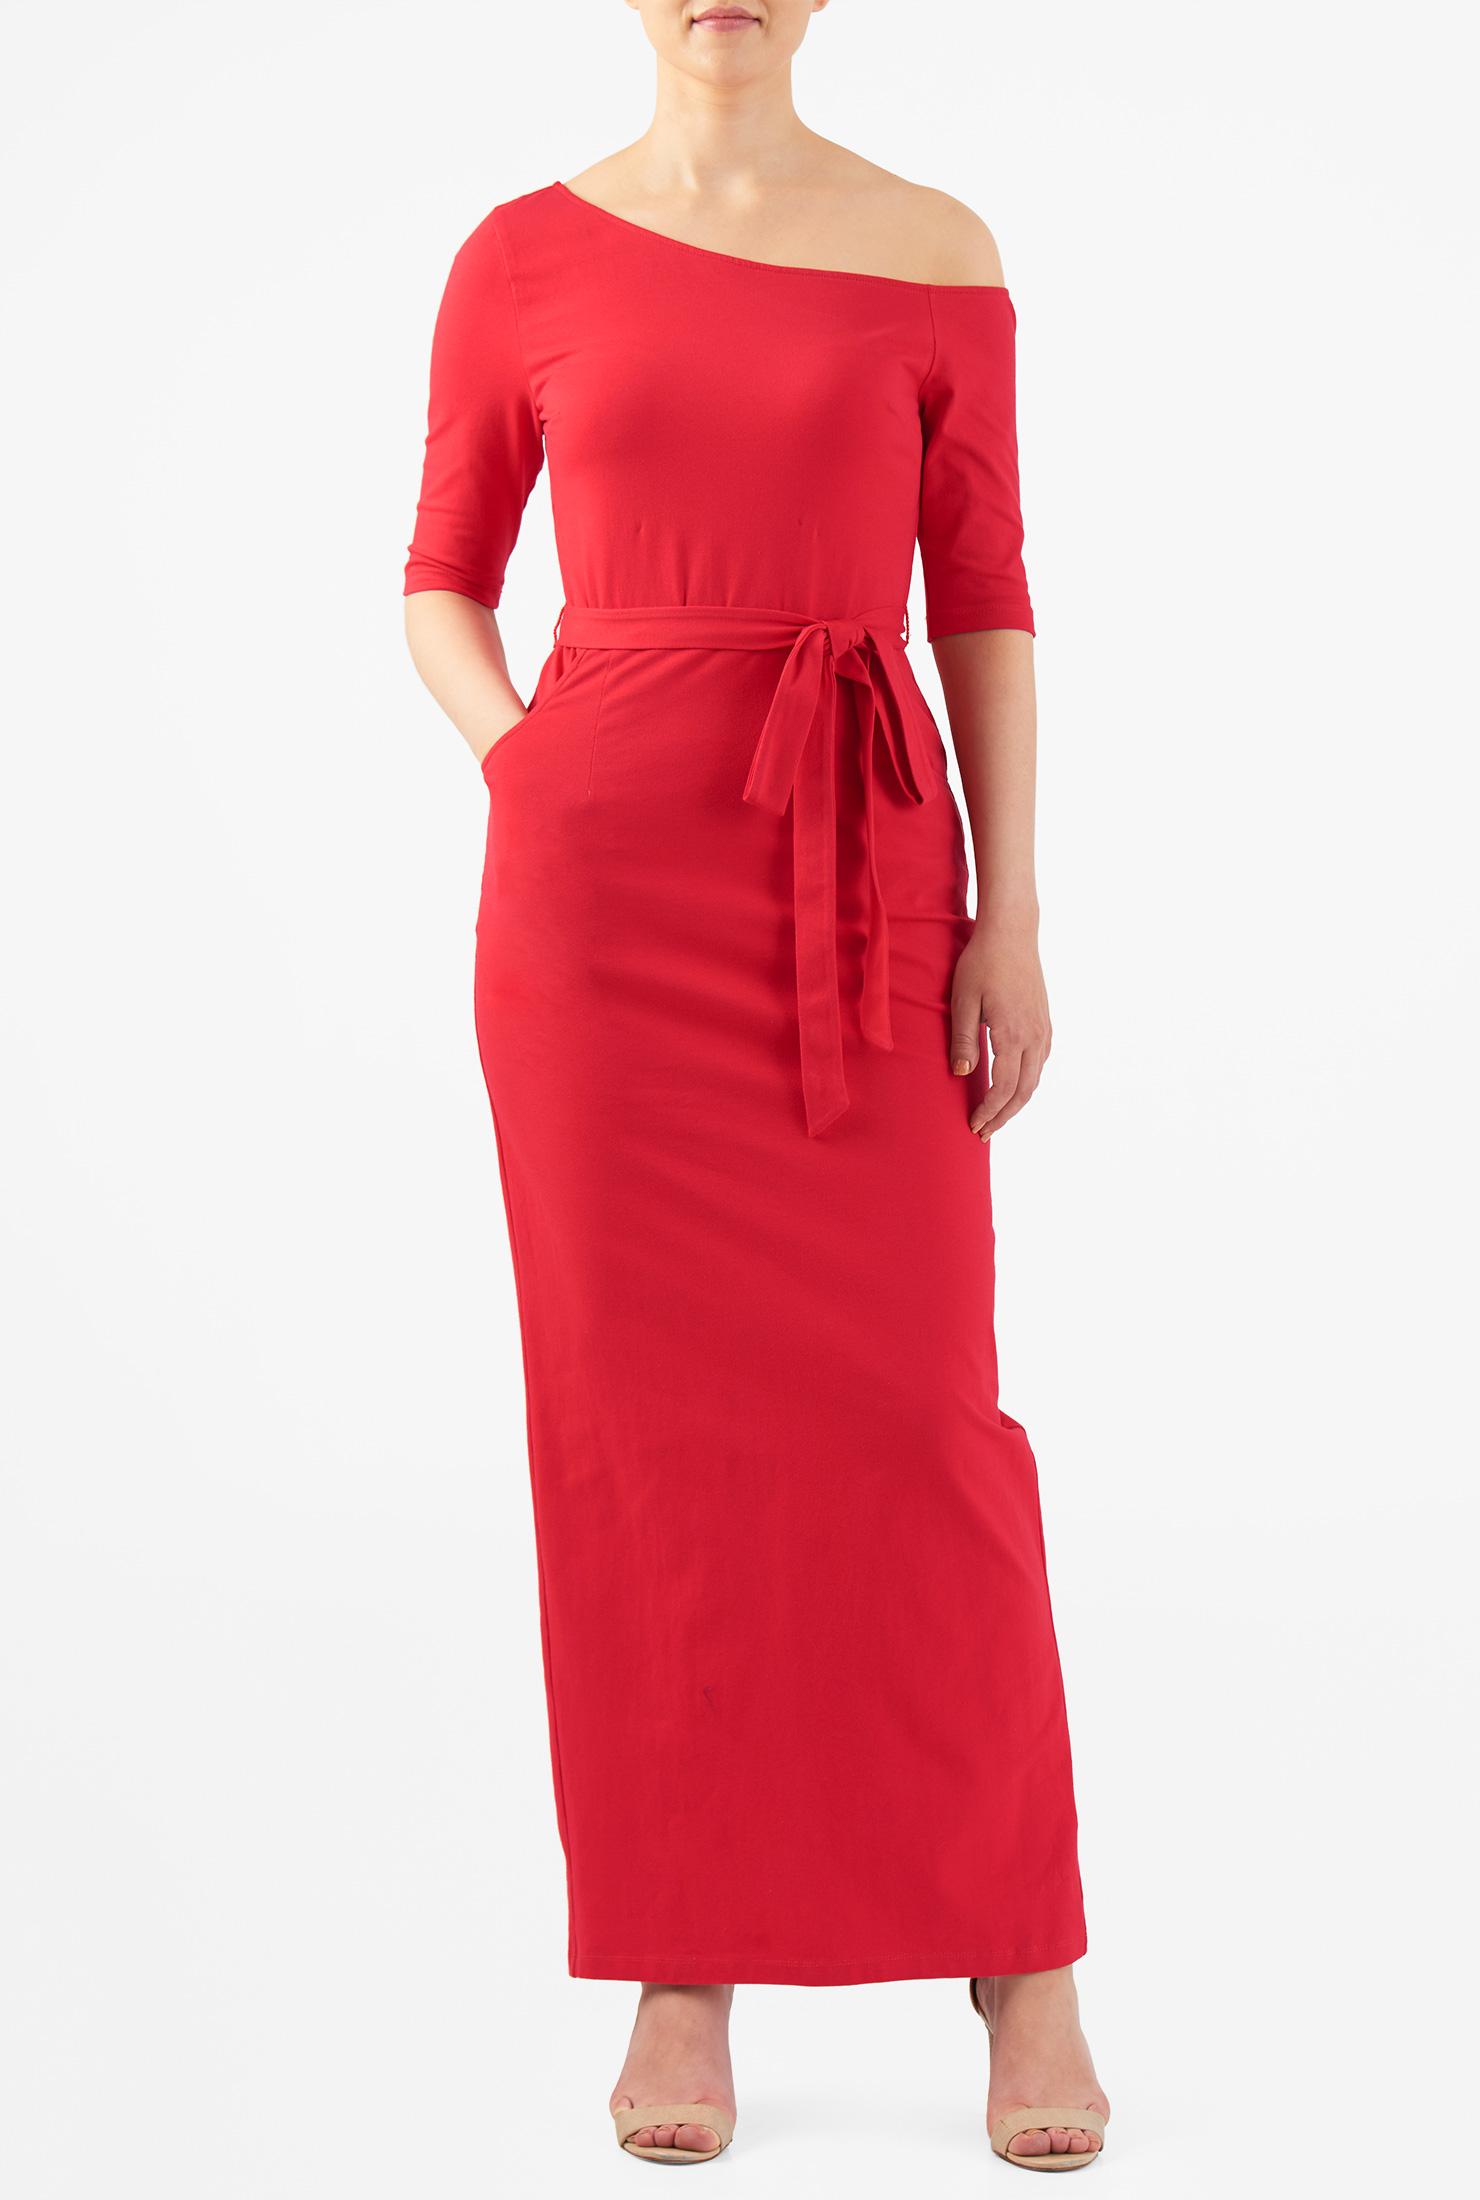 Eshakti Womens One Shoulder Cotton Knit Maxi Dress